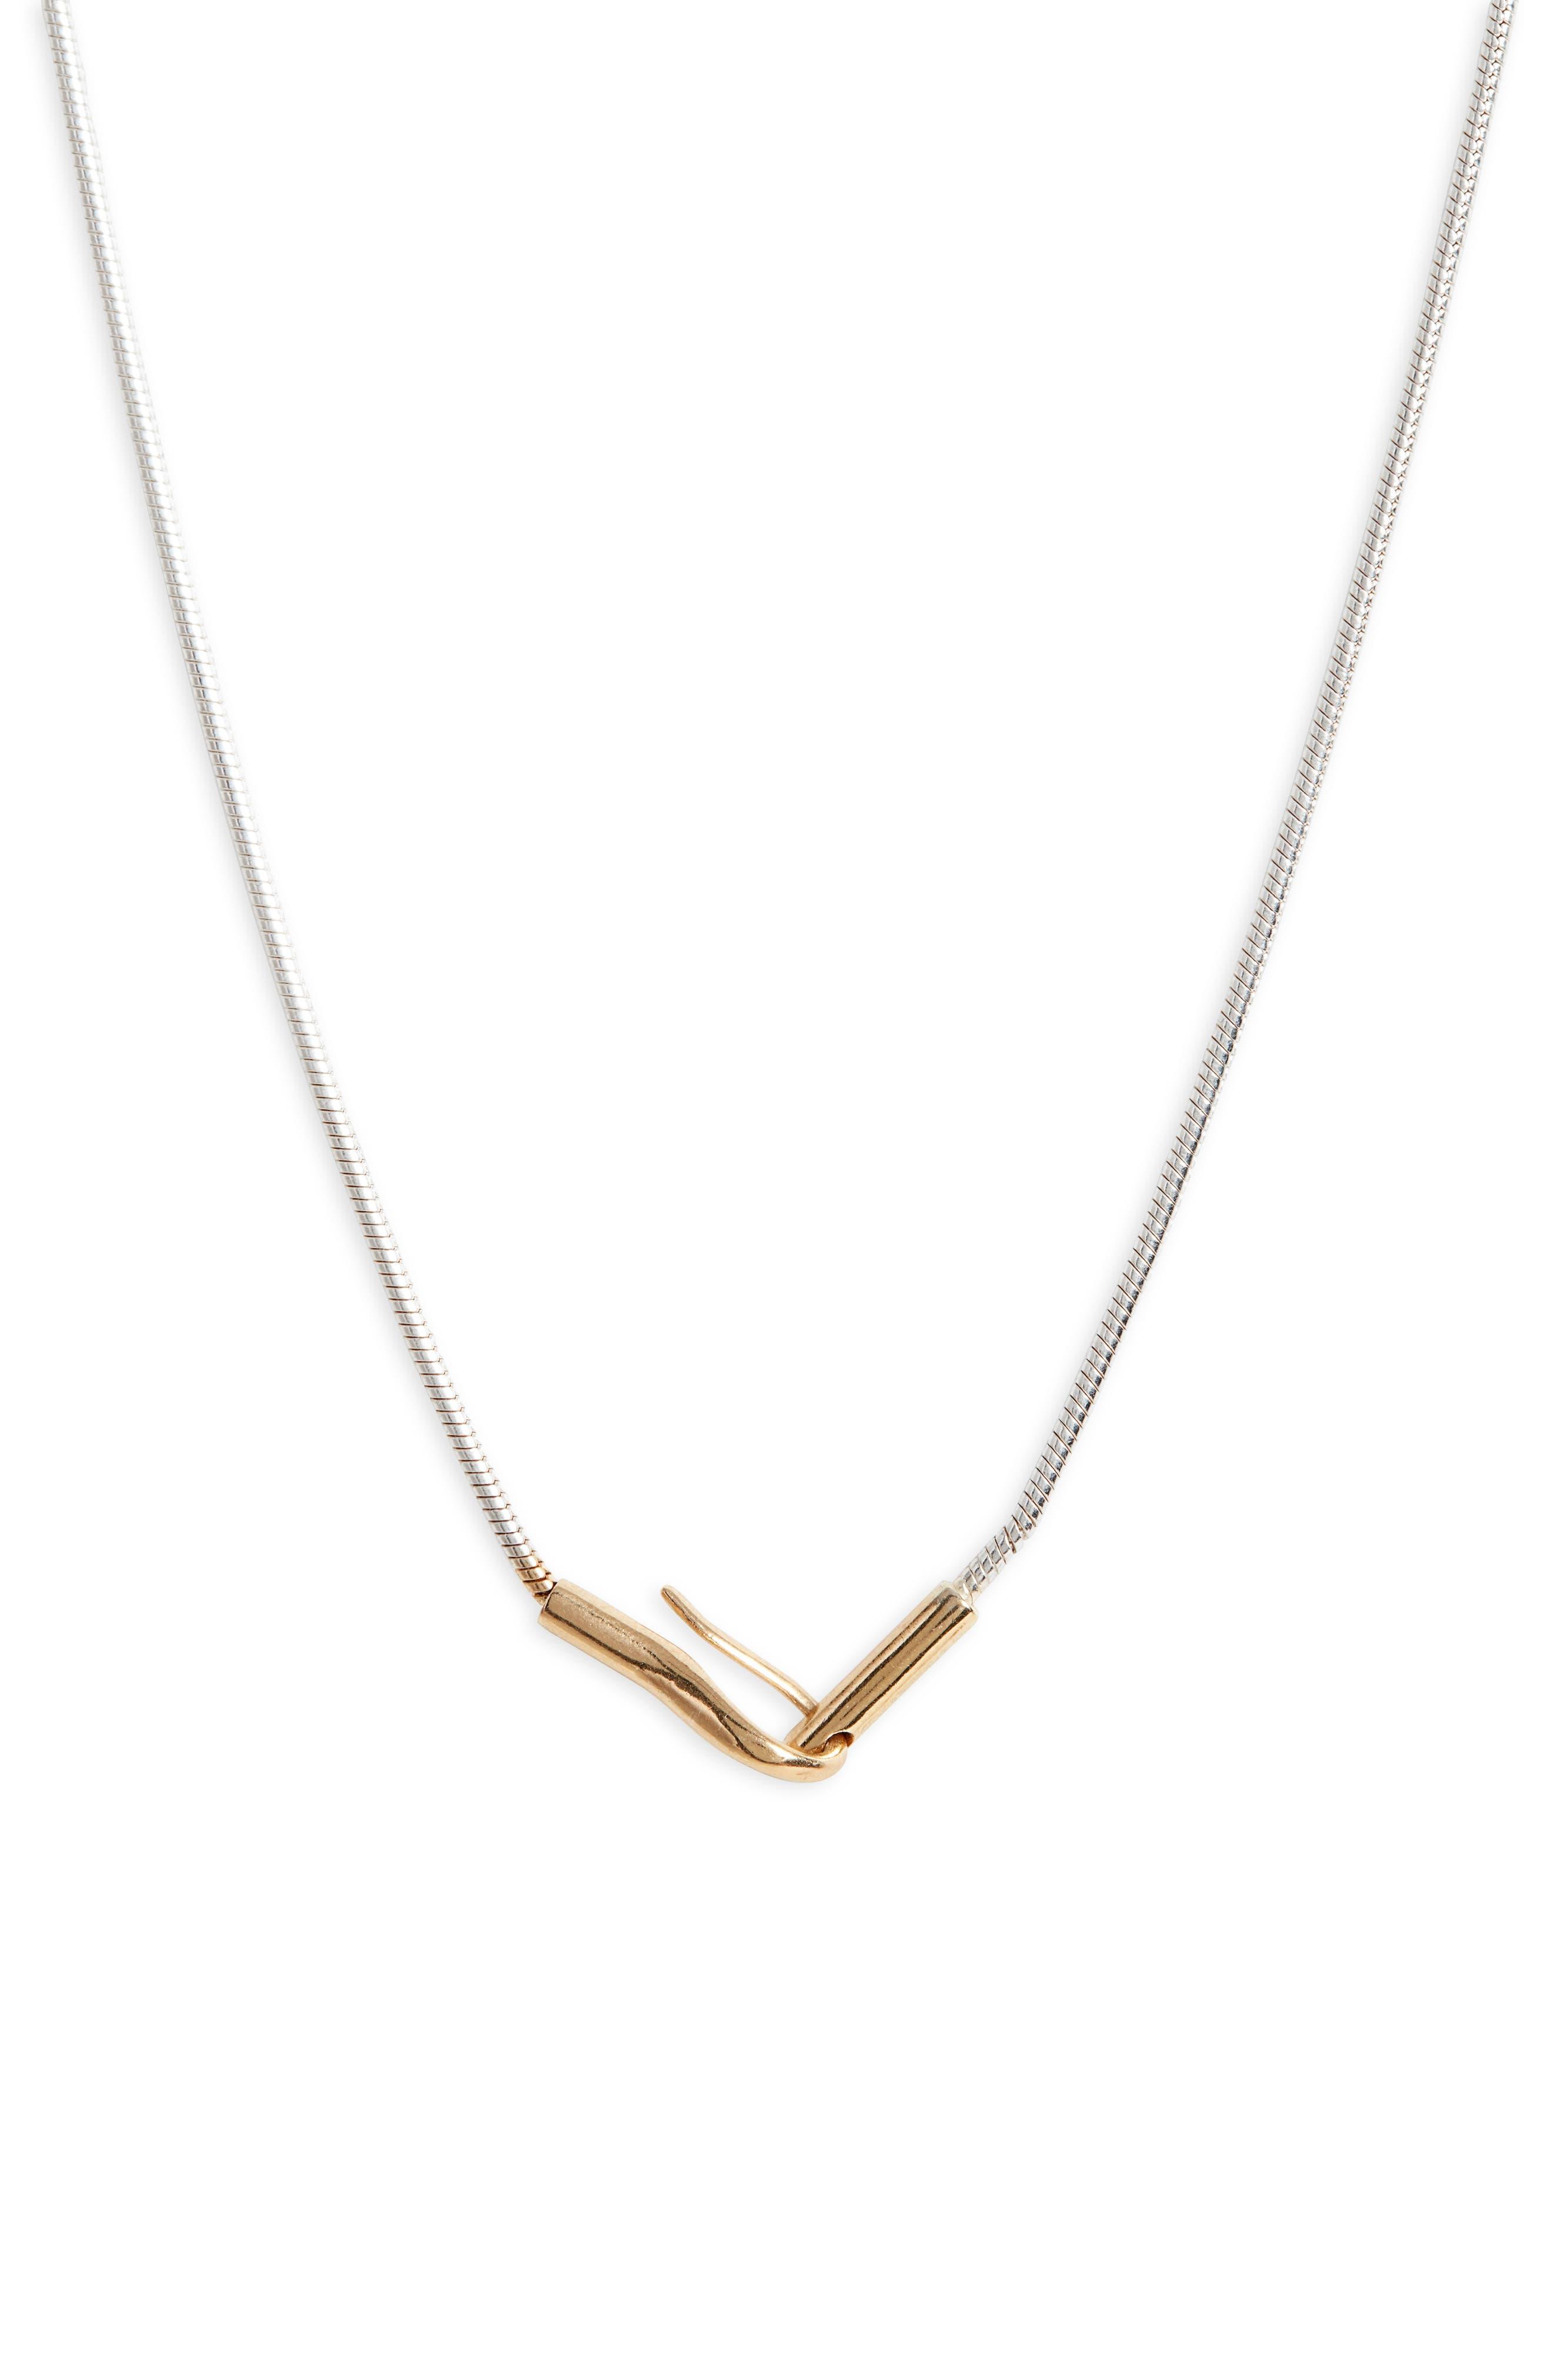 Hook Pendant Necklace